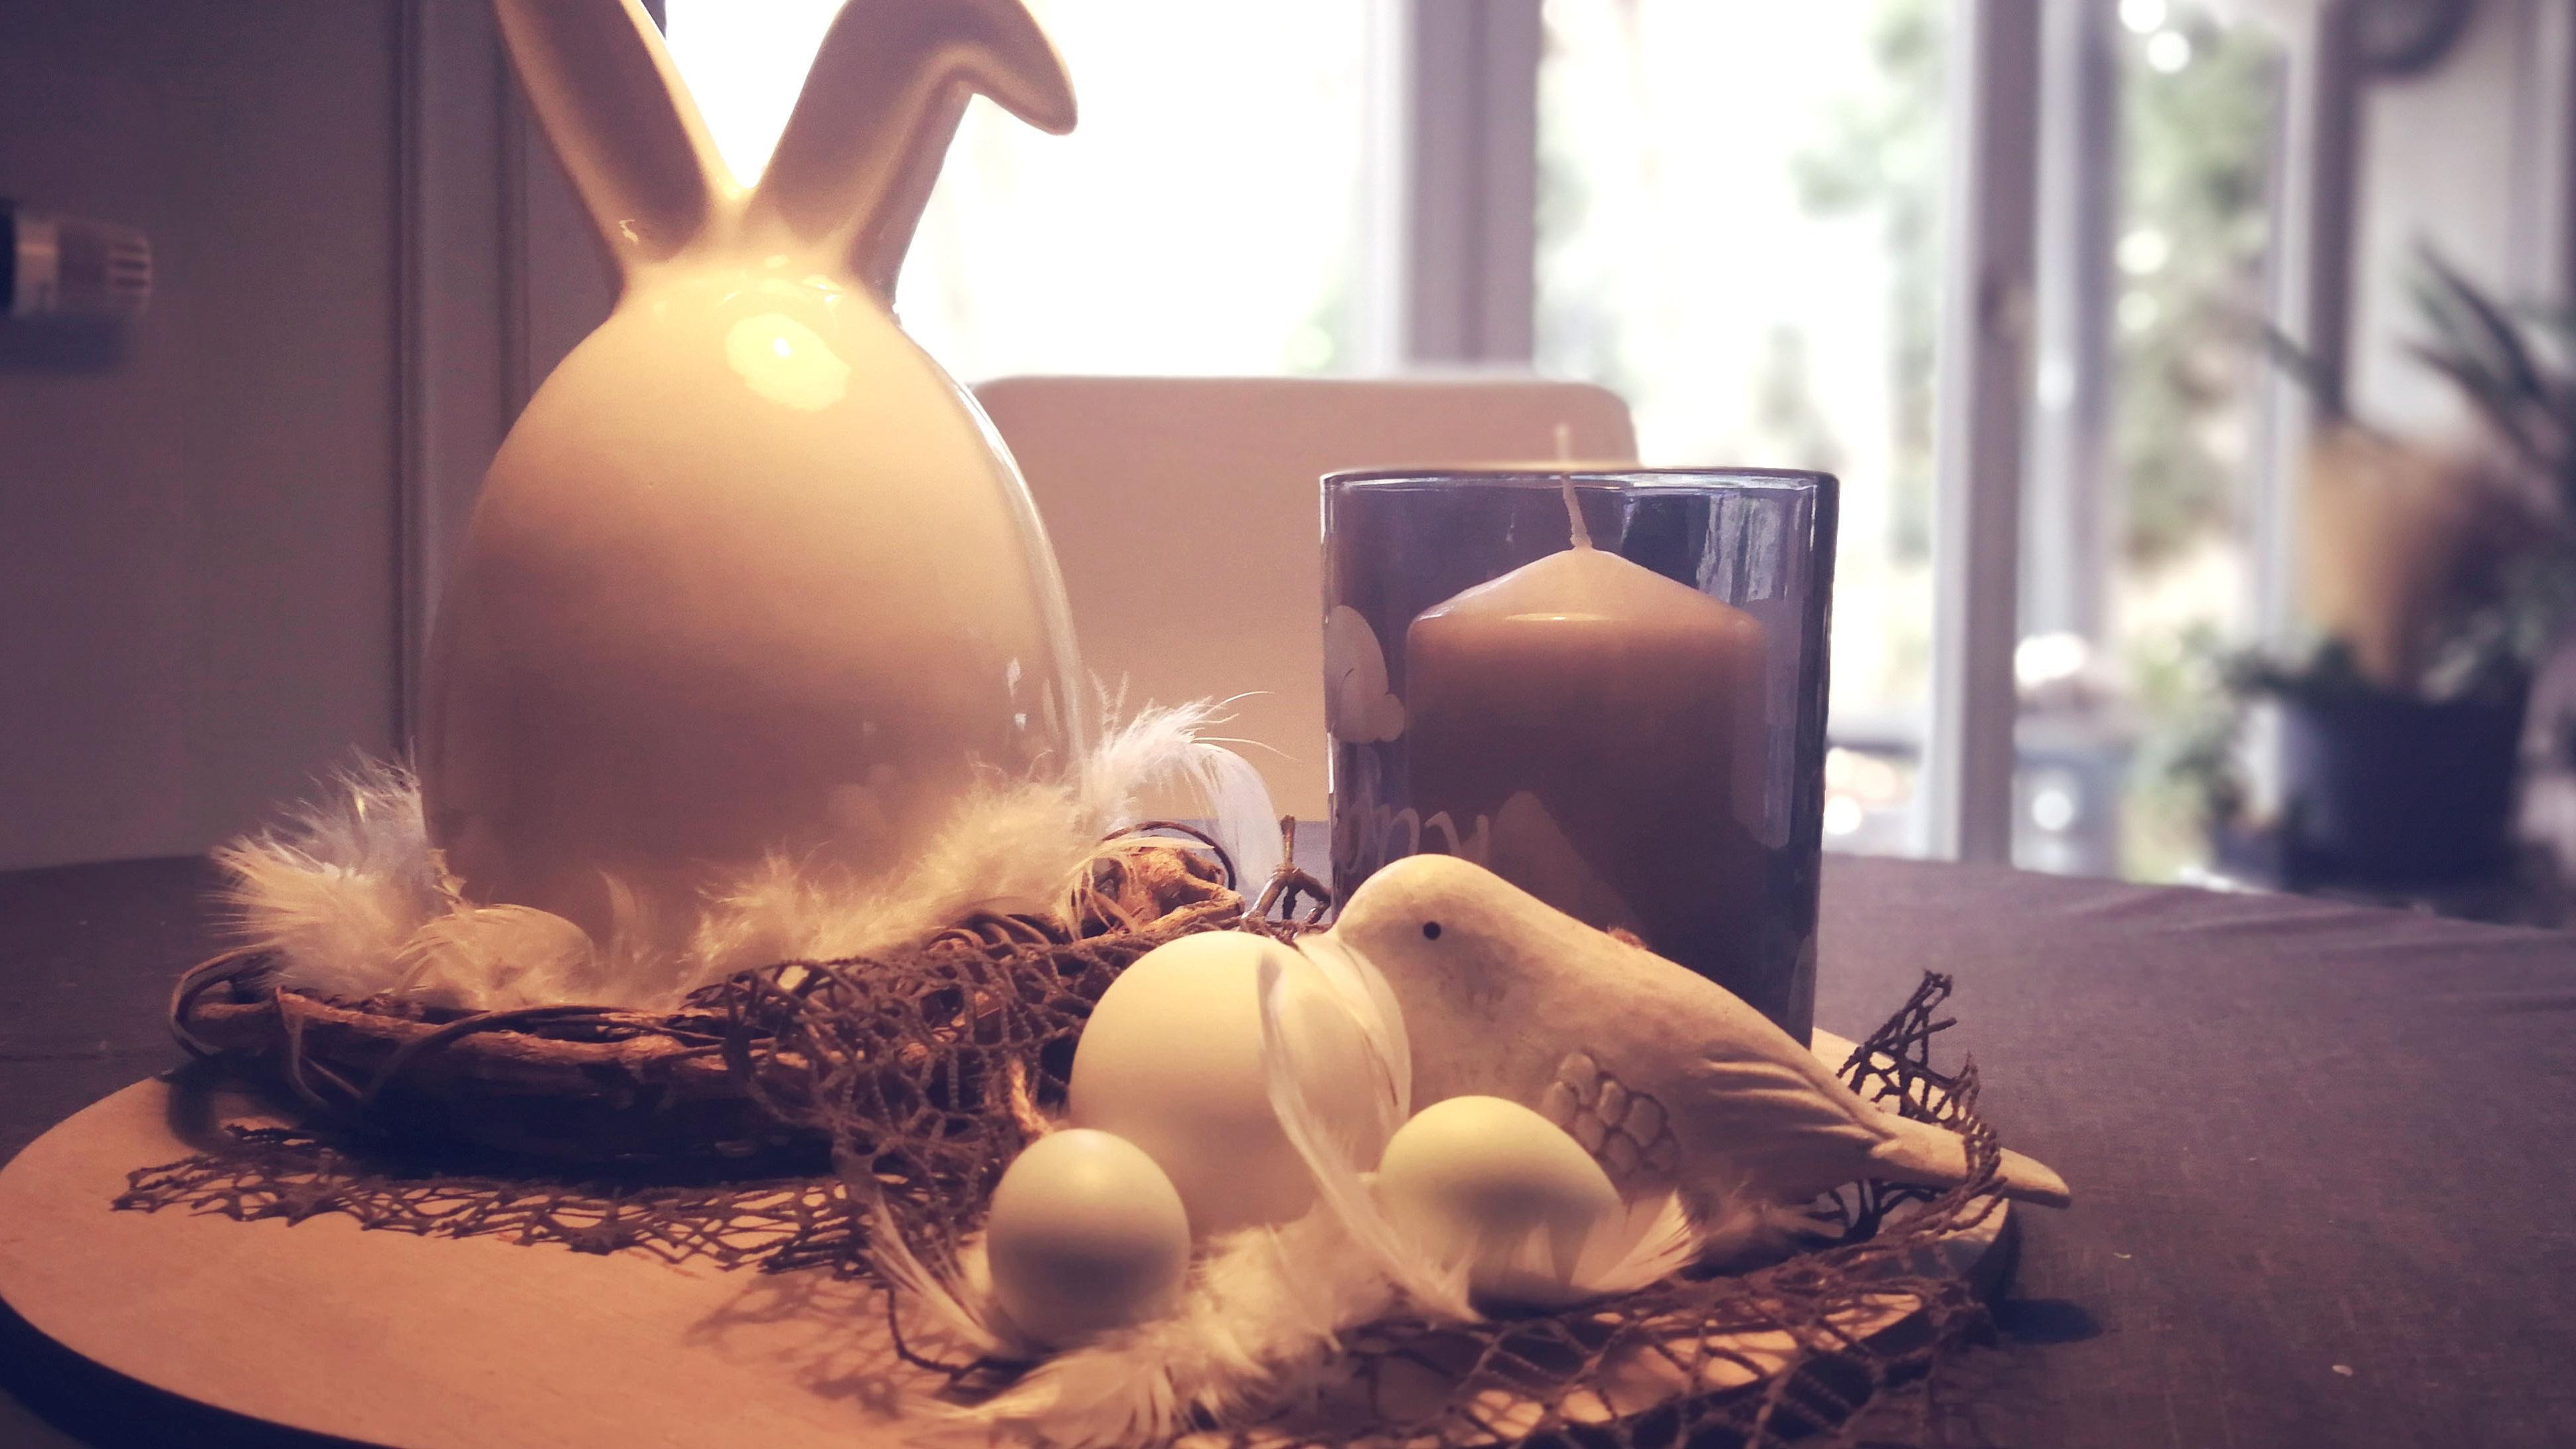 Mal was anderes: Ein Keramik-Ei mit Hasenohren